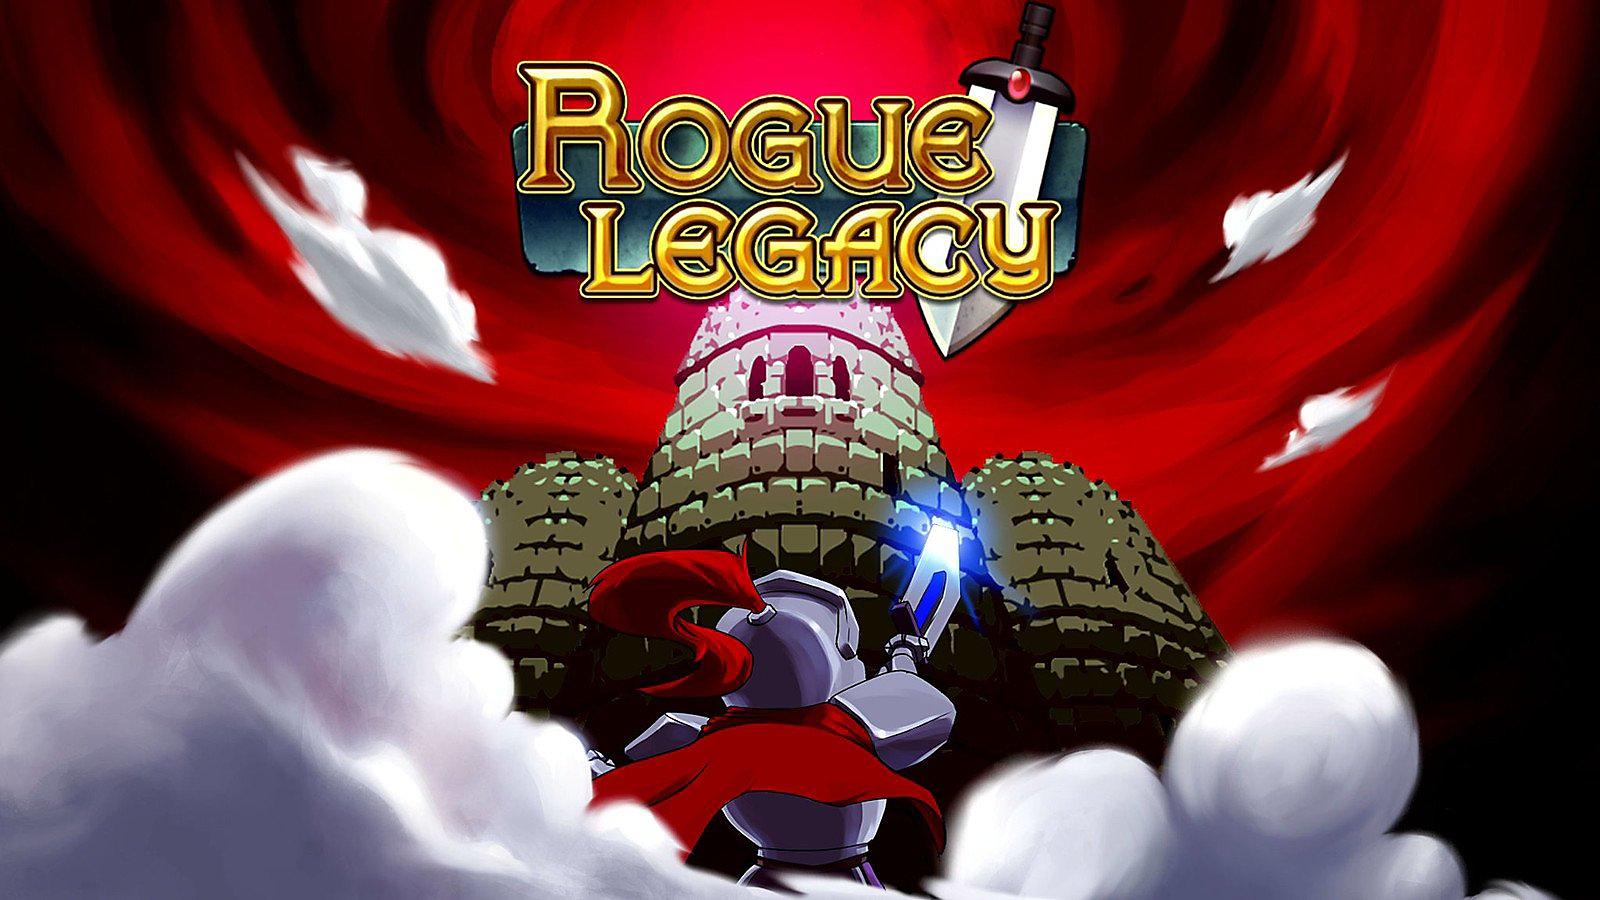 Rogue Legacy key-art